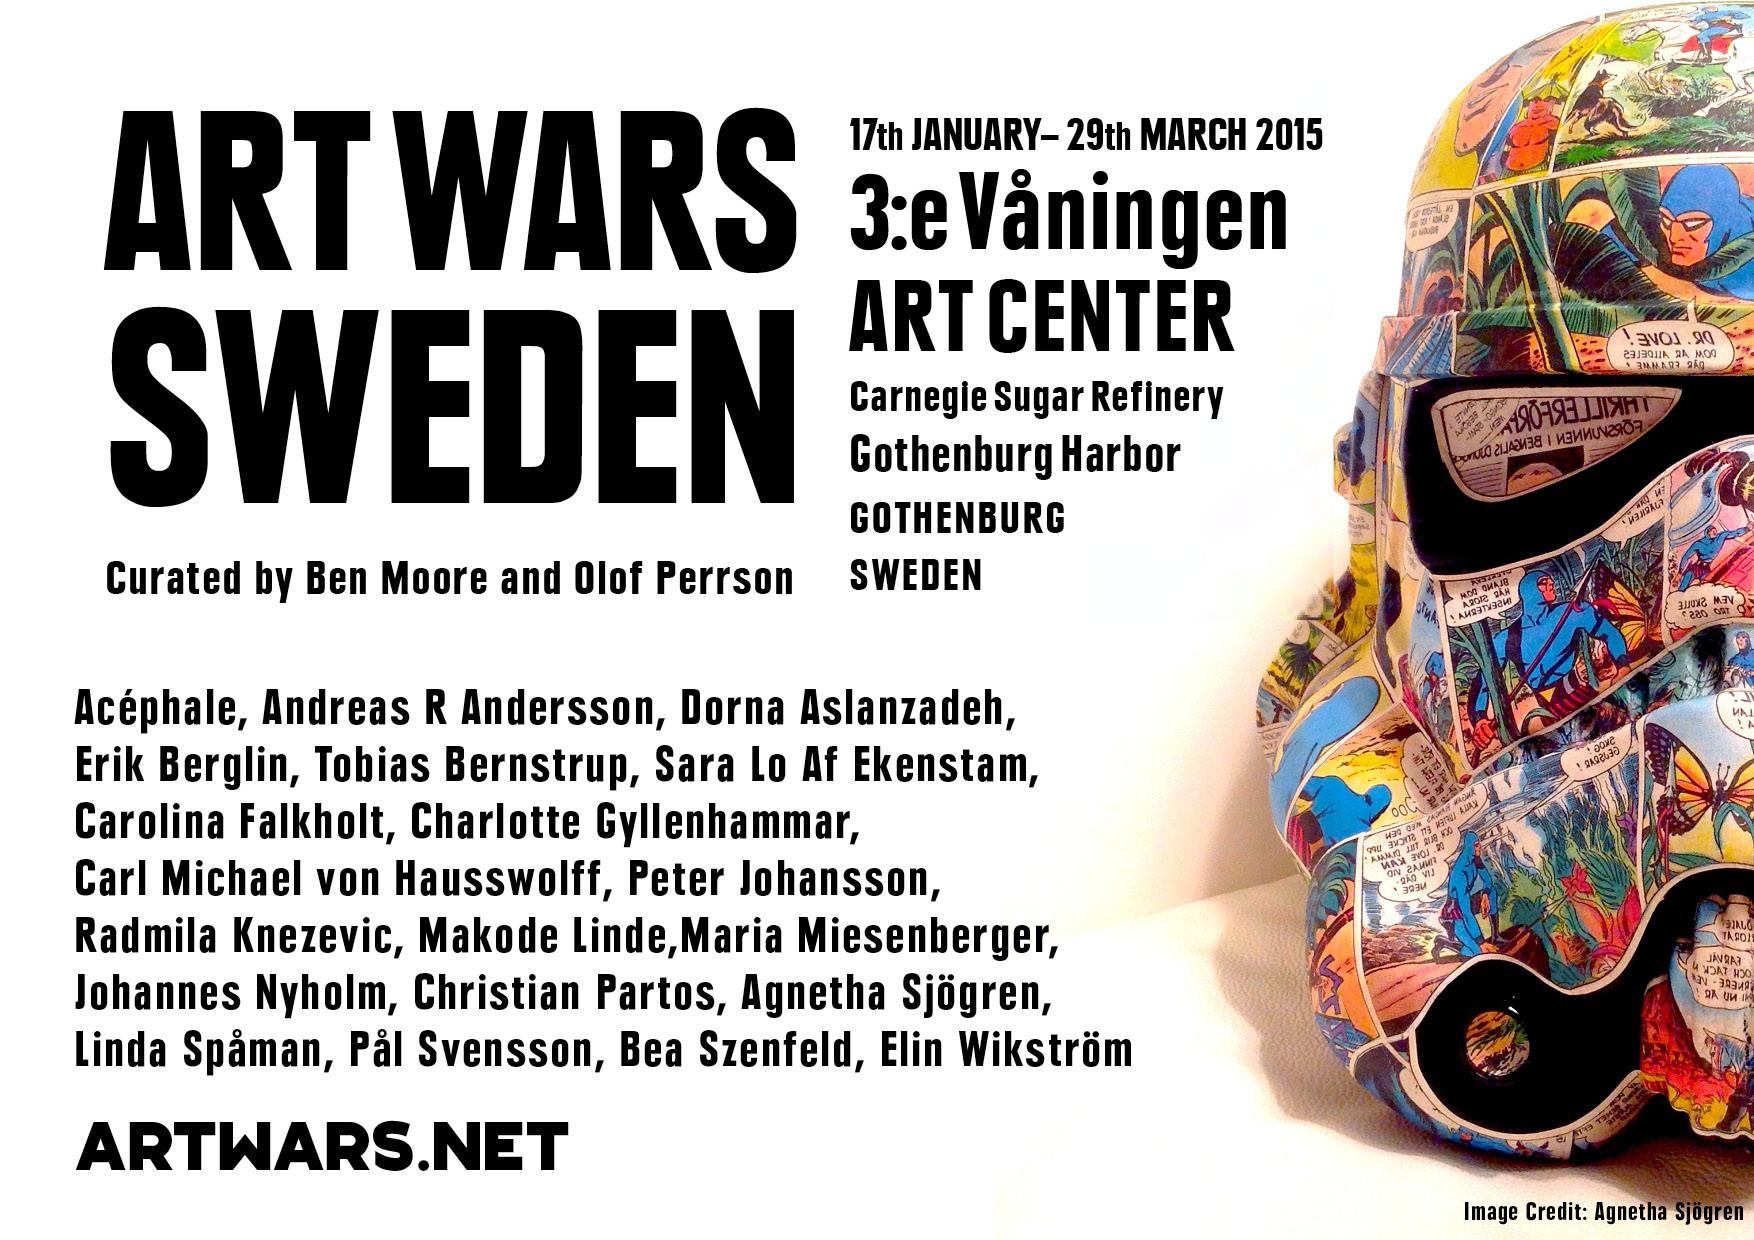 ArtWarsSweden_Flyer.jpg